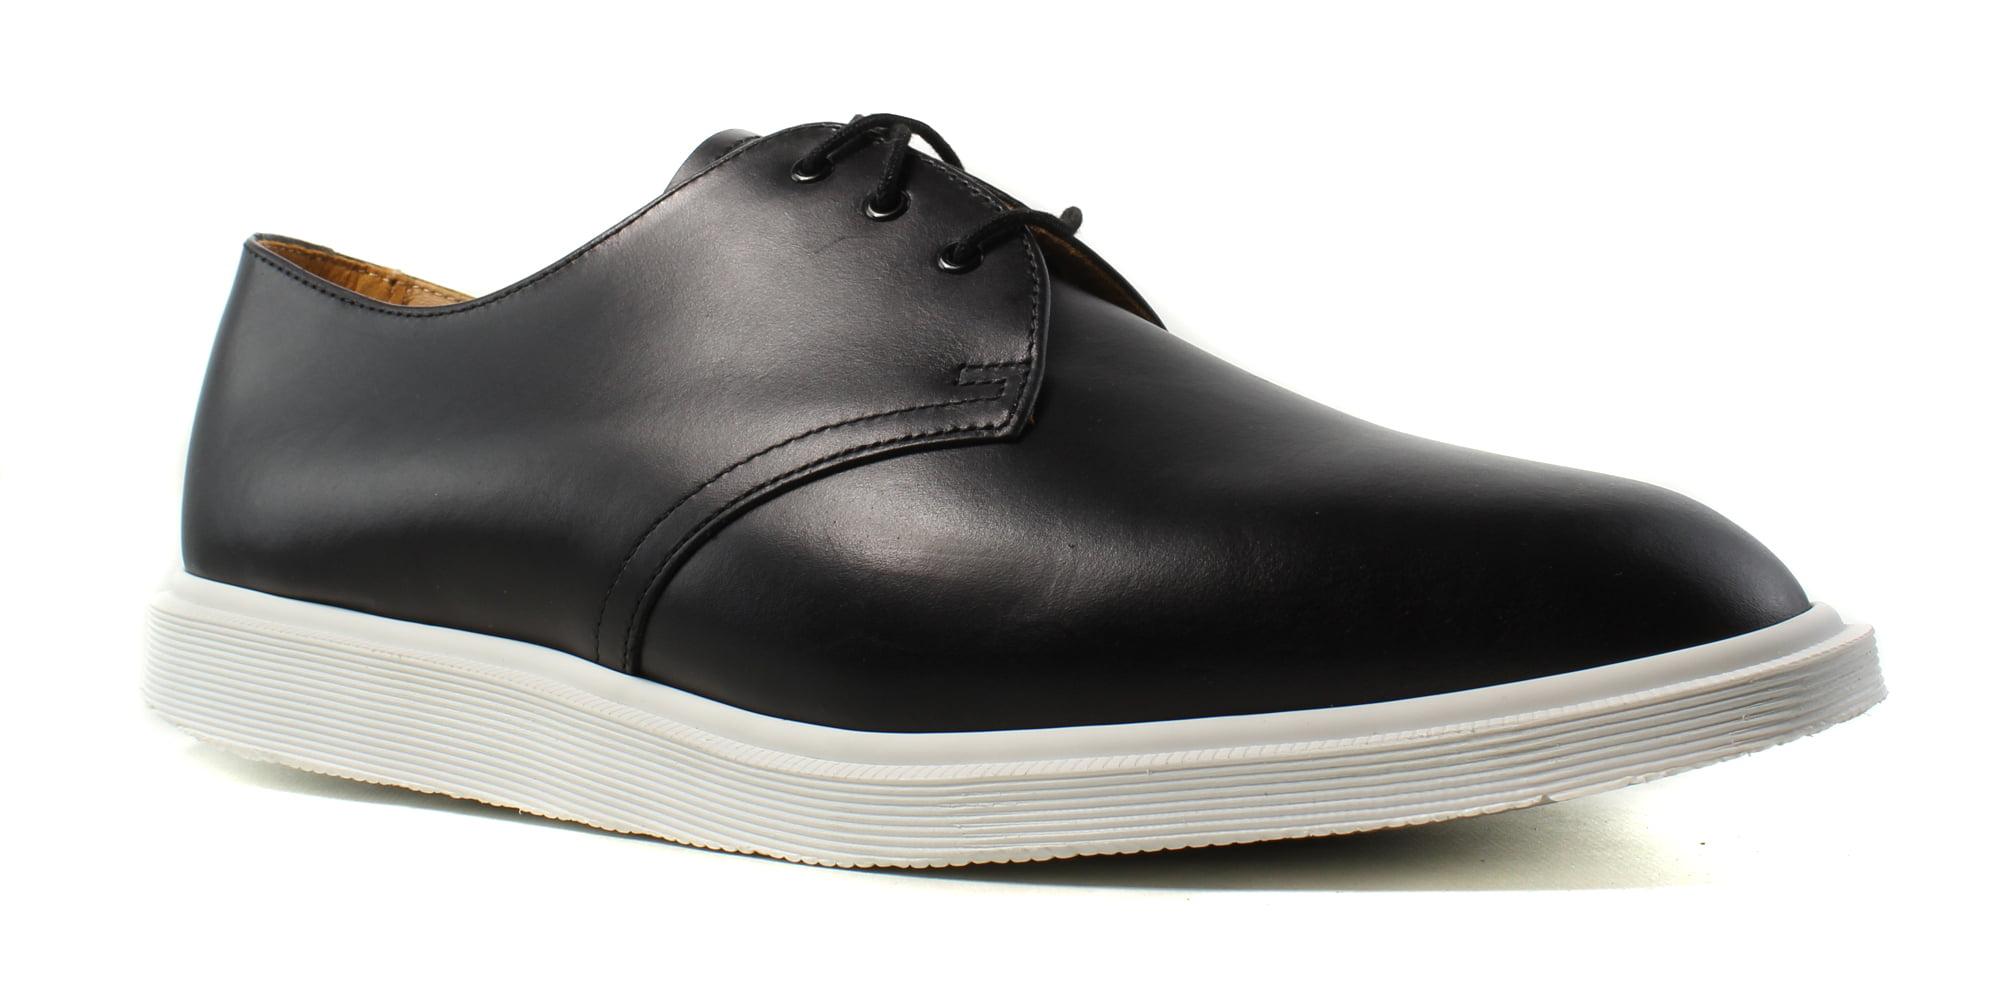 Dr. Martens Men's Torriano 3 Eye Shoe by Dr. Martens